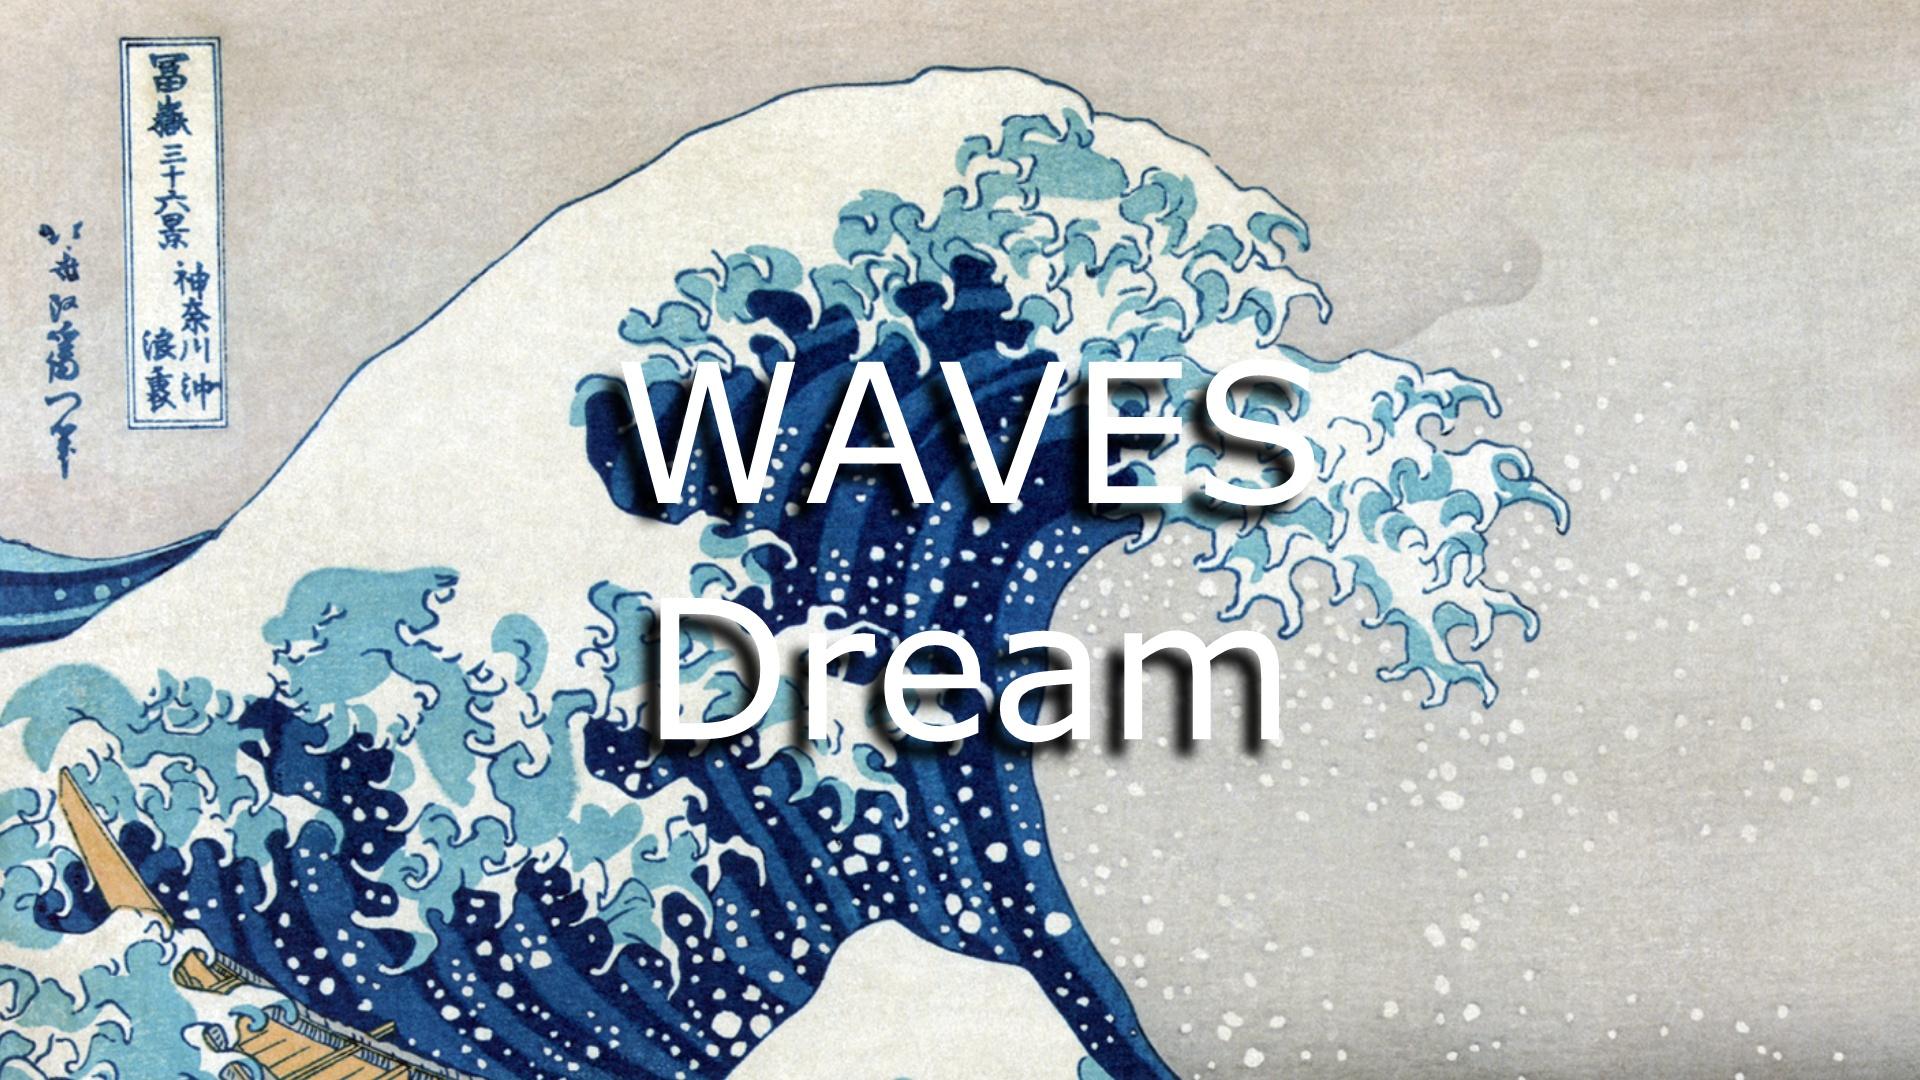 Dream of waves crashing over me